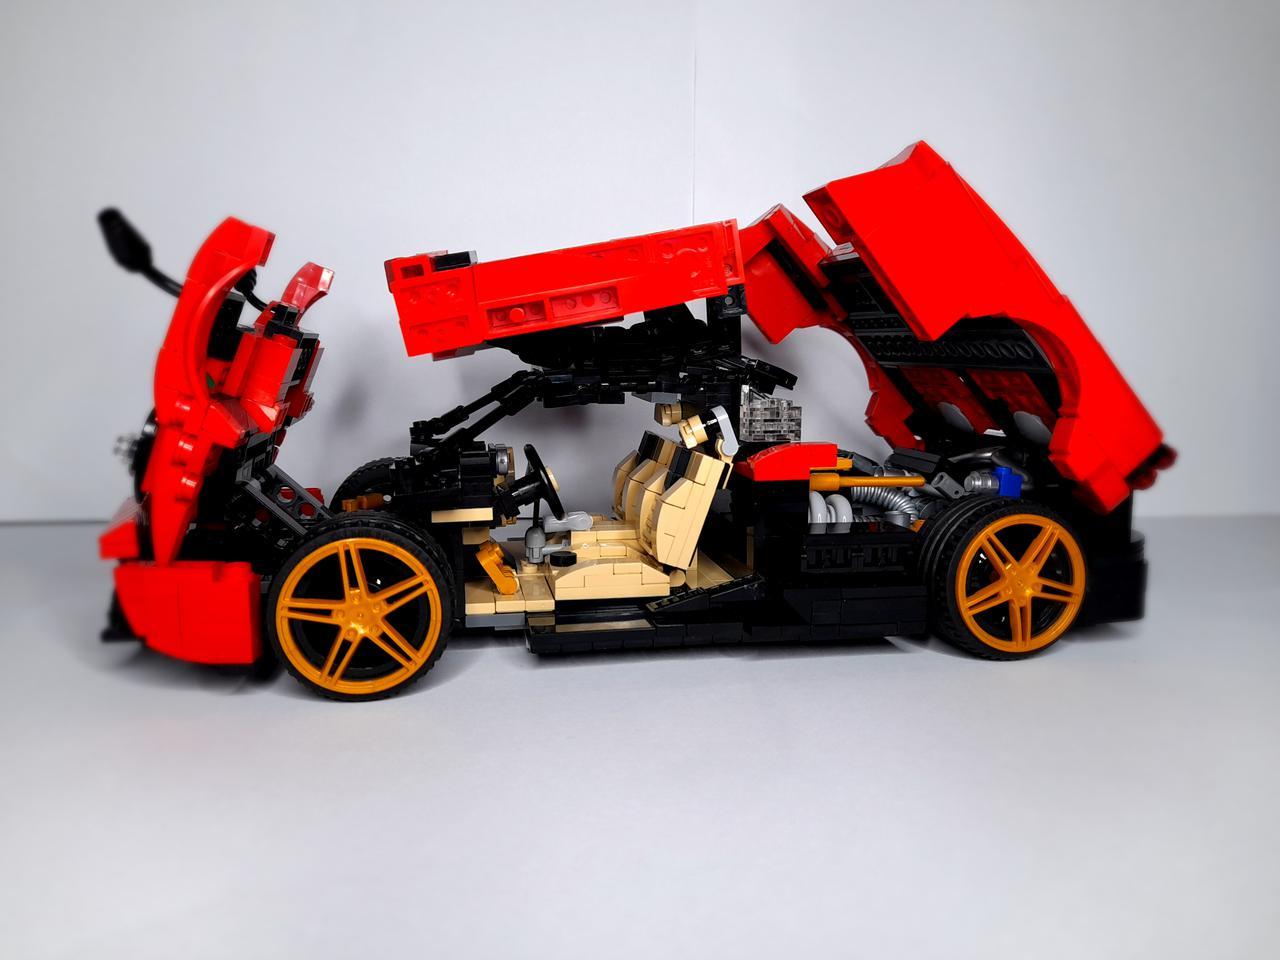 1280x960.jpg